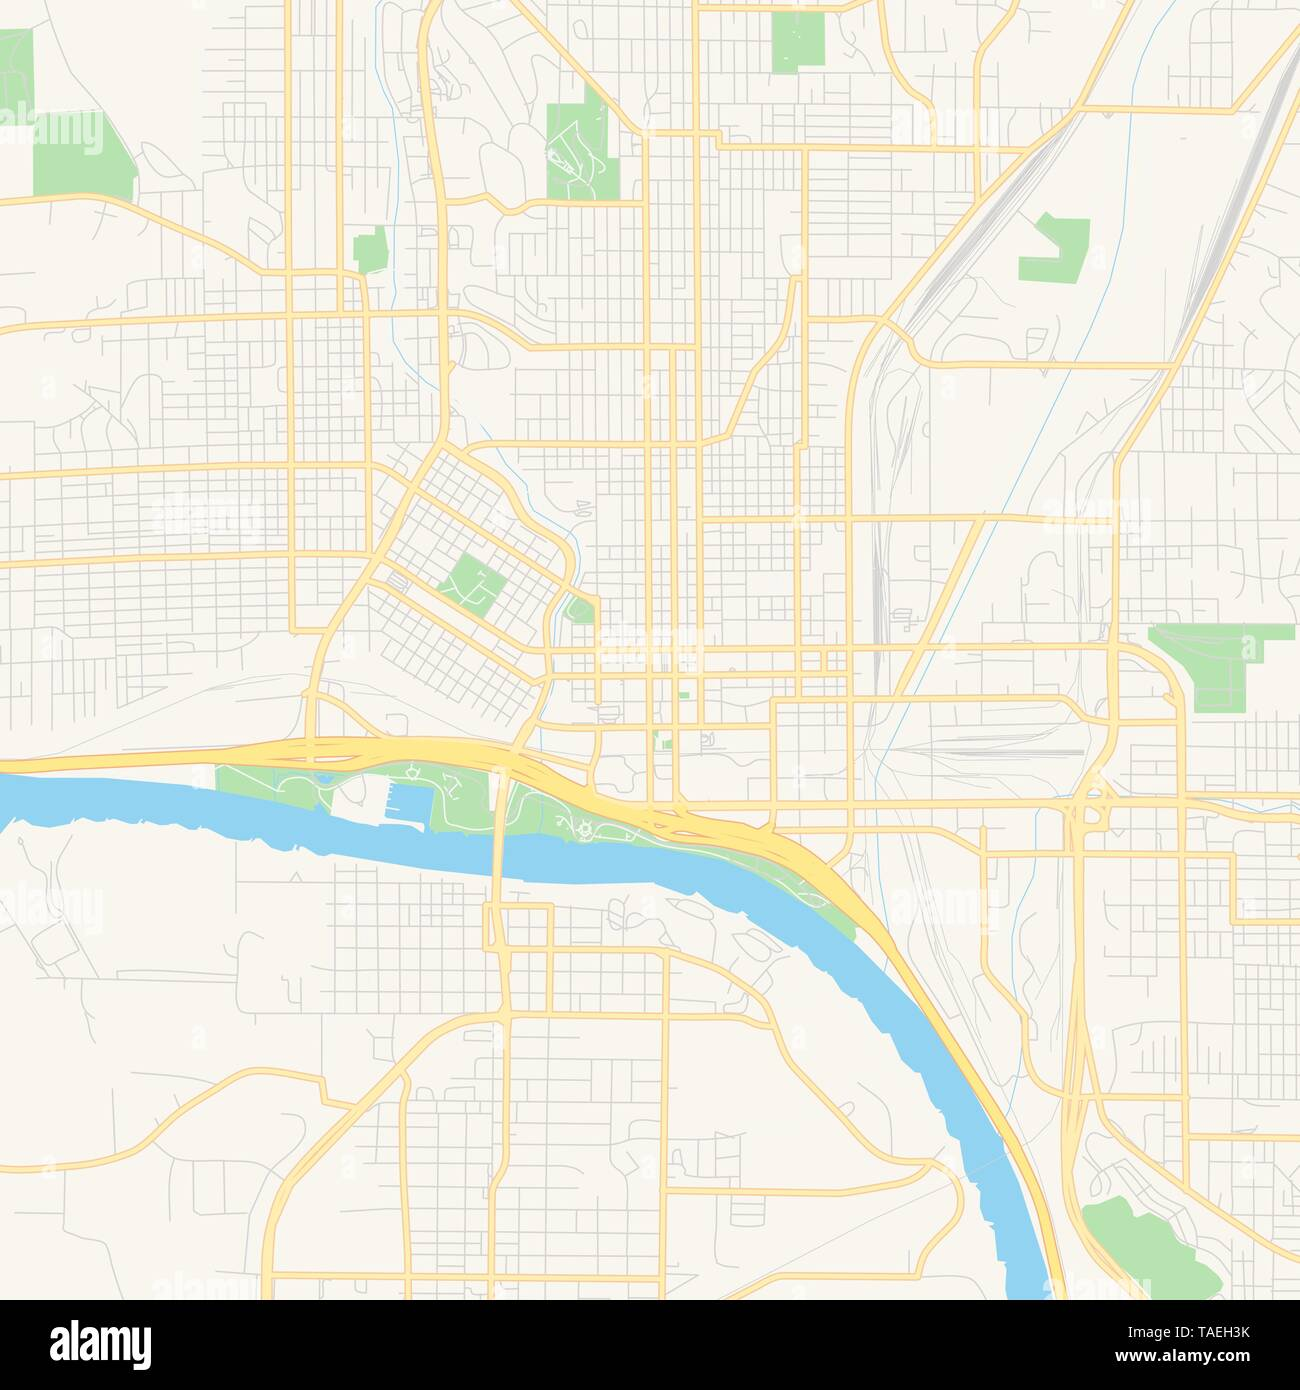 Iowa Infographic Stock Photos & Iowa Infographic Stock